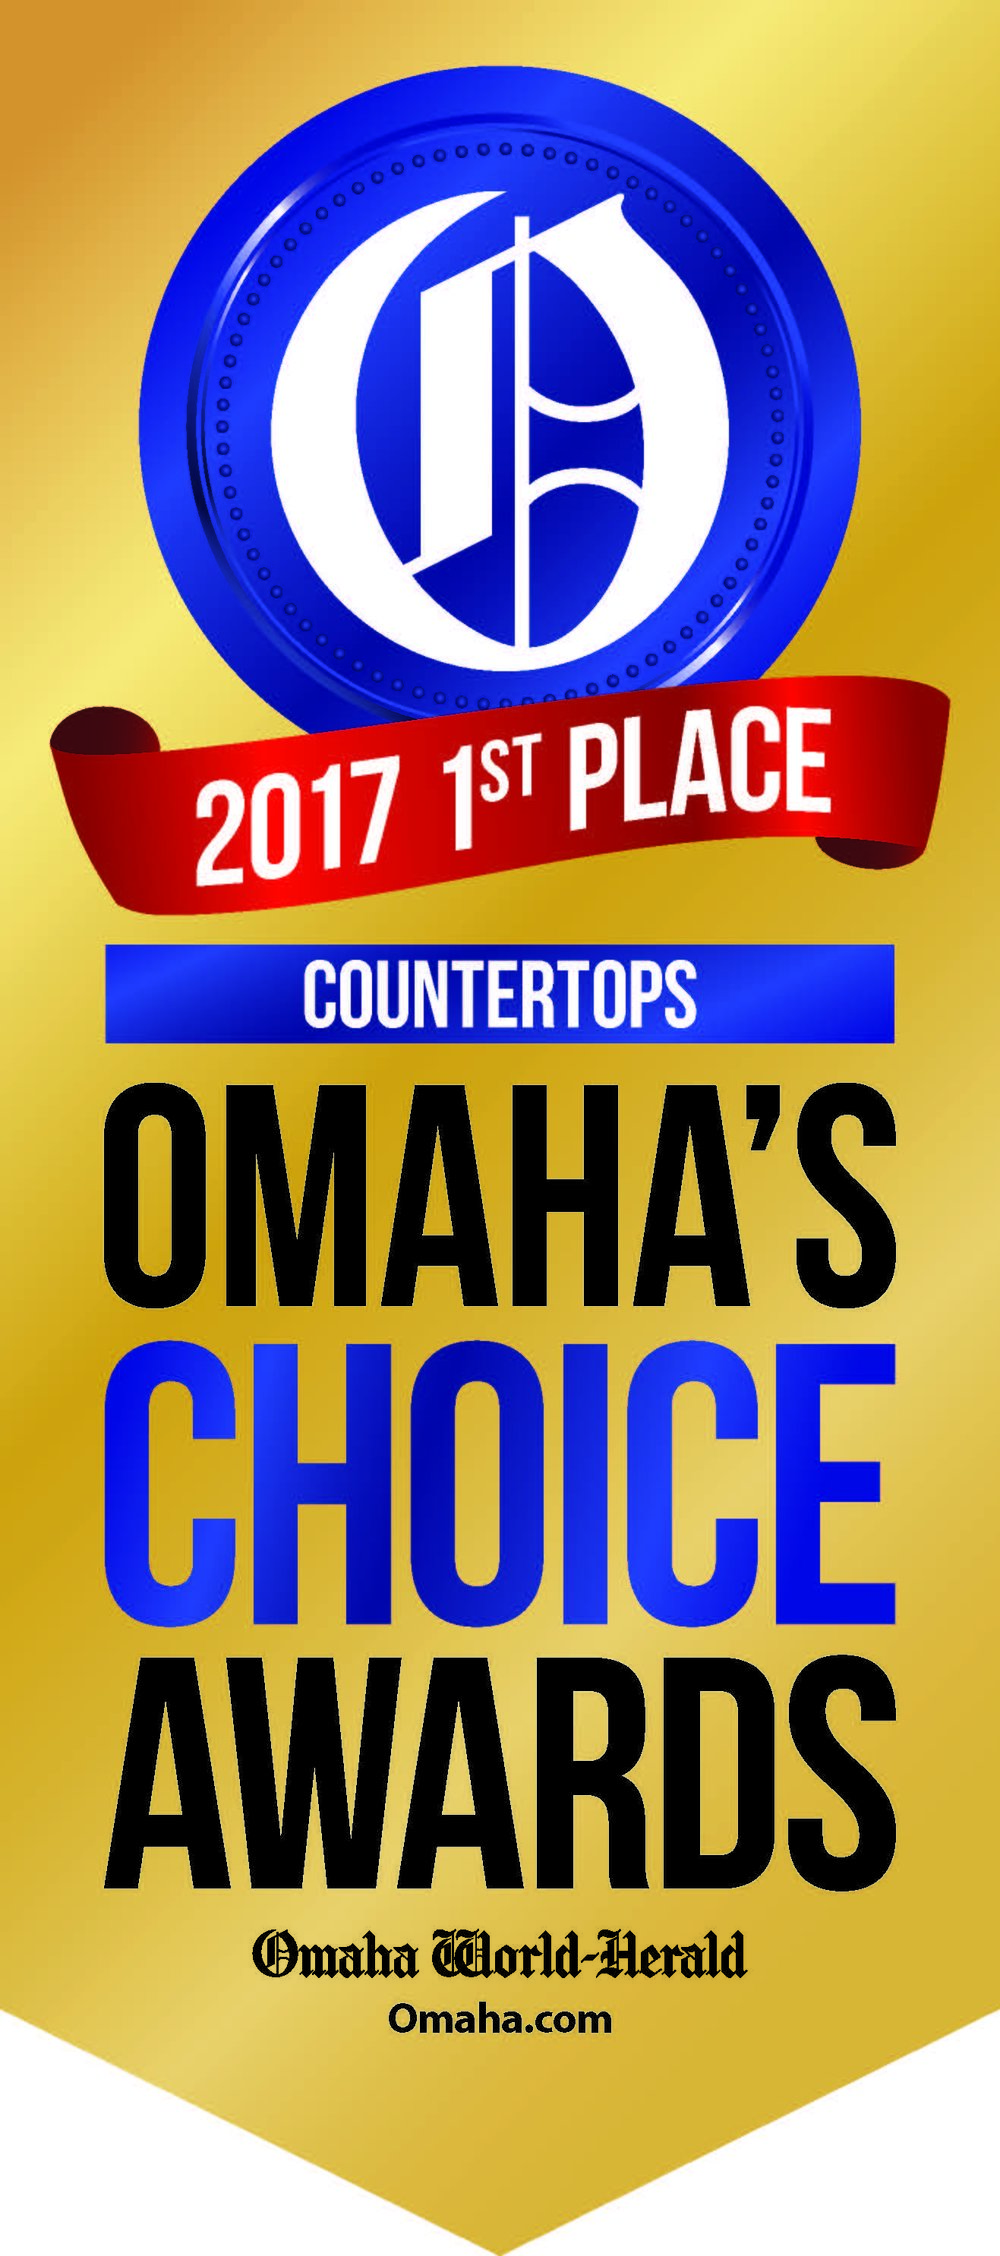 2017 Omahas Choice Awards 1st Place (Countertops).jpg